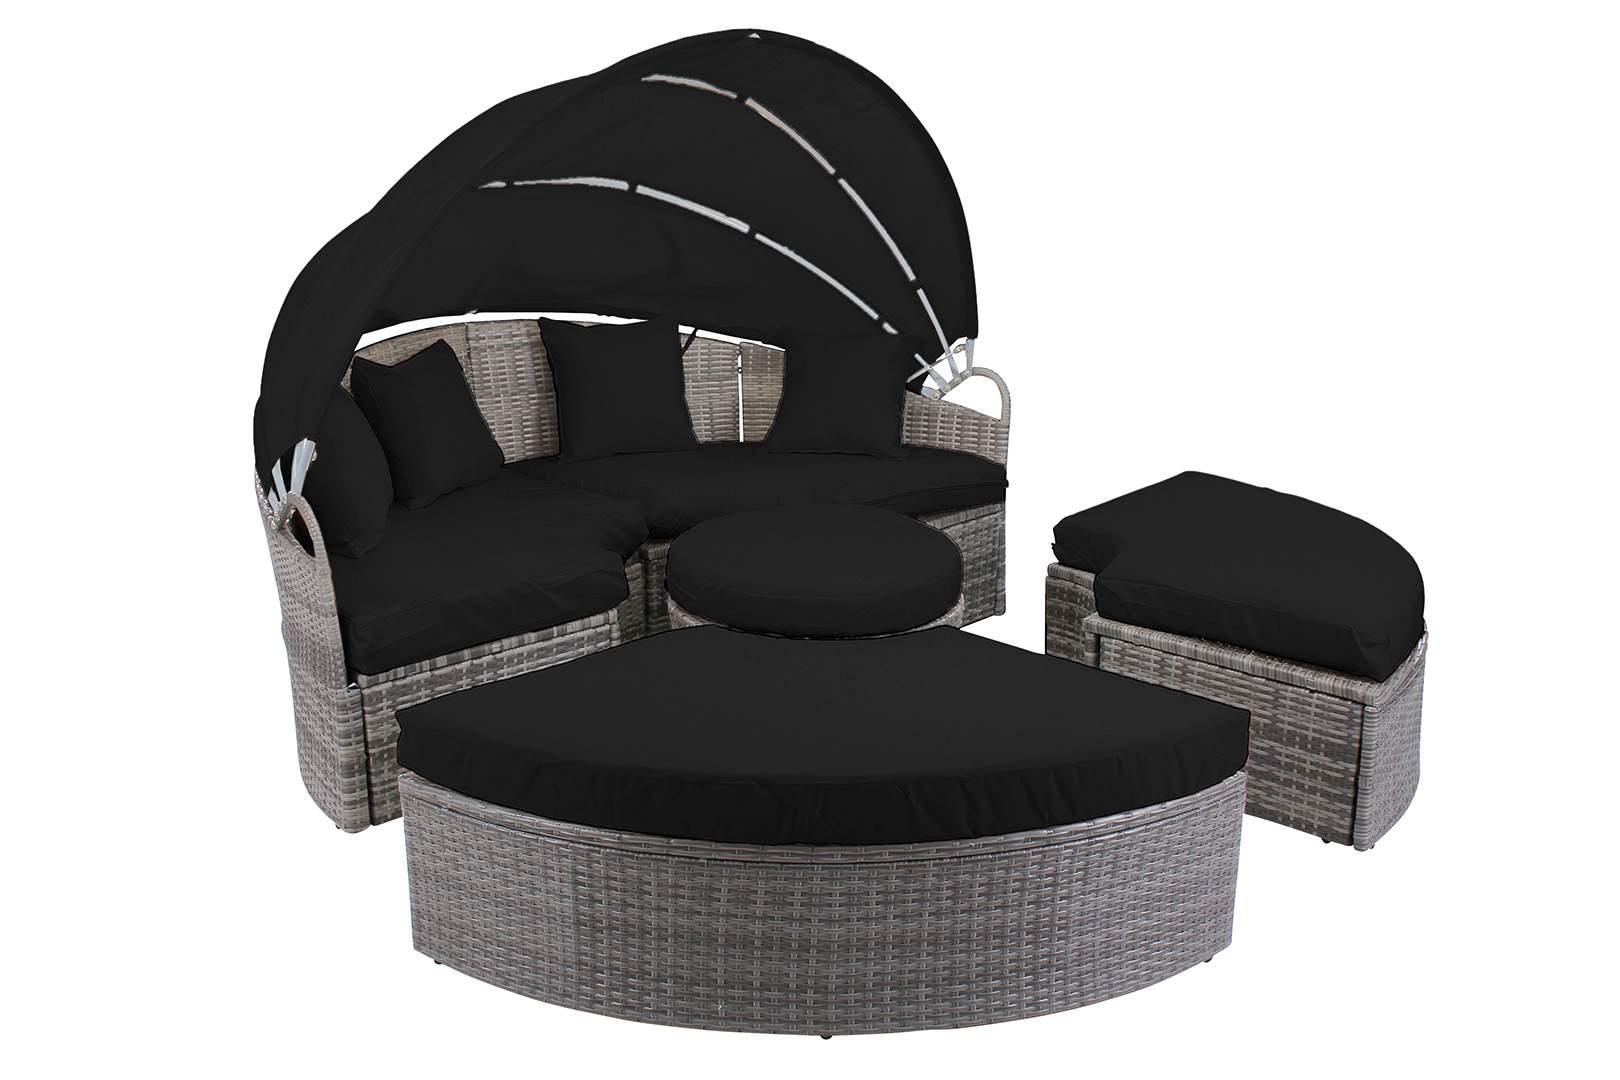 Miweba Rattan Lounge Paradise 180 Grau D3034 startbild schwarz OL 1620x1080